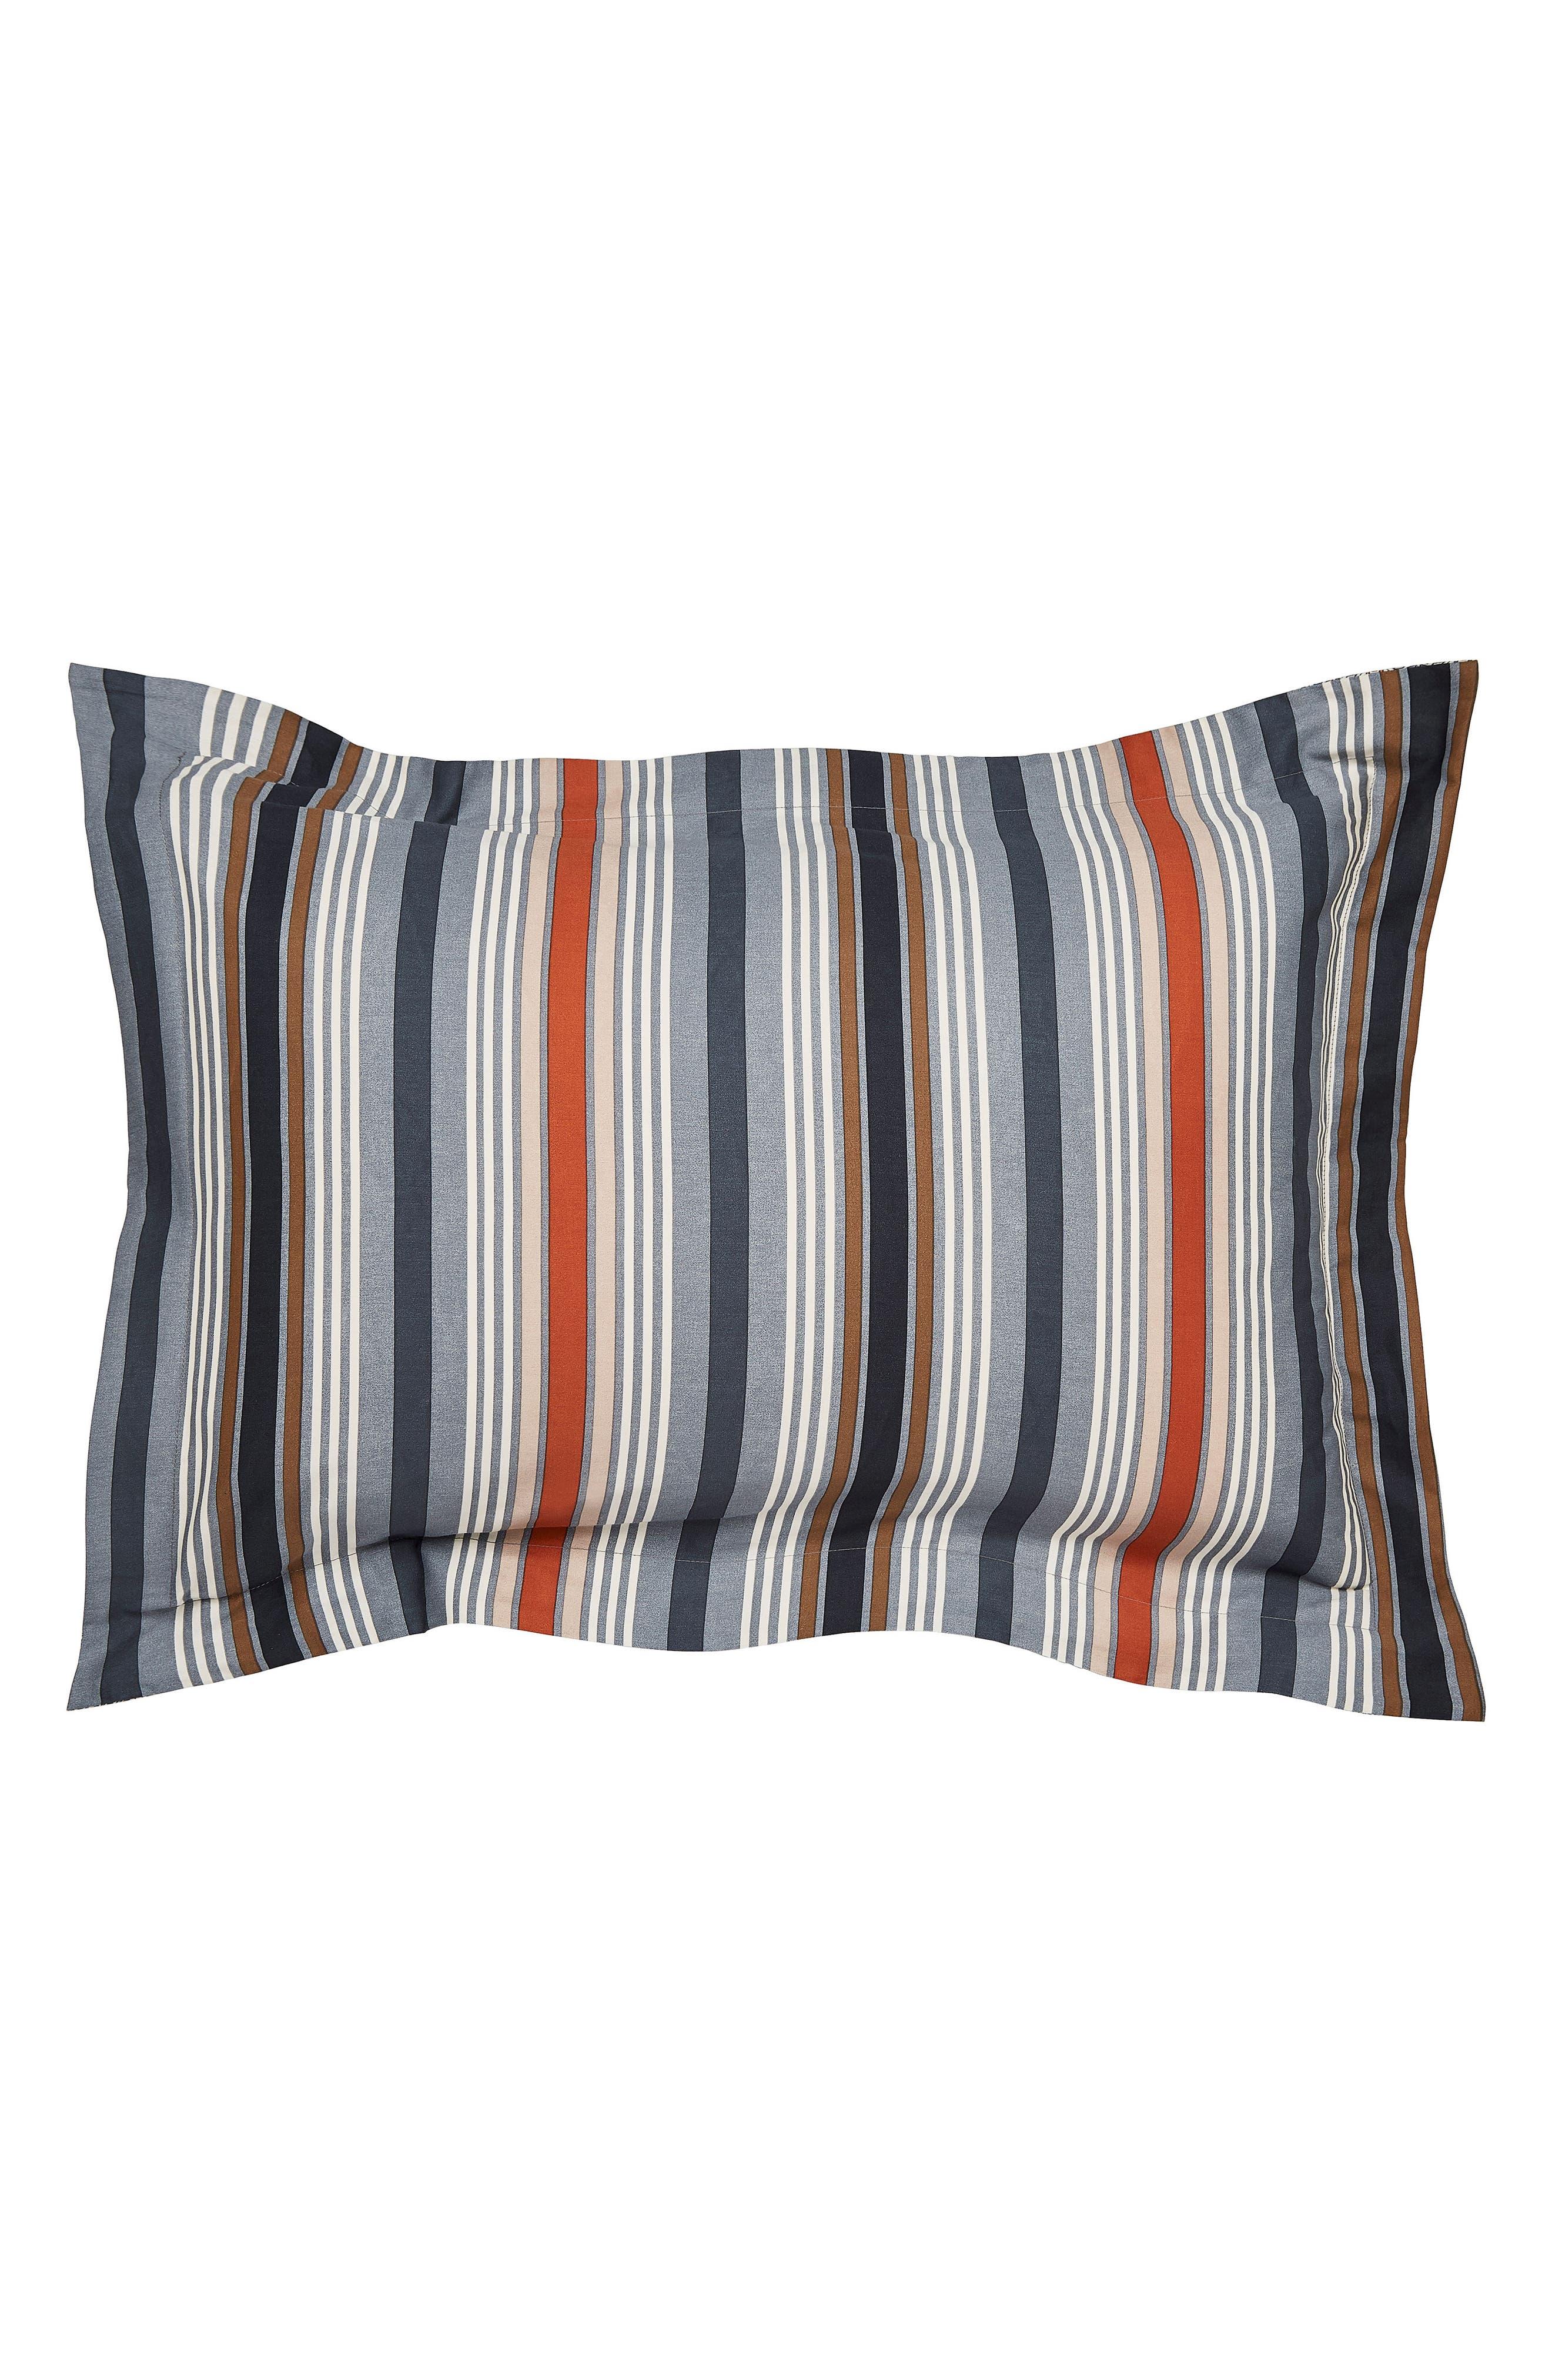 Alba Duvet Cover, Sham & Accent Pillow Set,                             Alternate thumbnail 4, color,                             BLUE